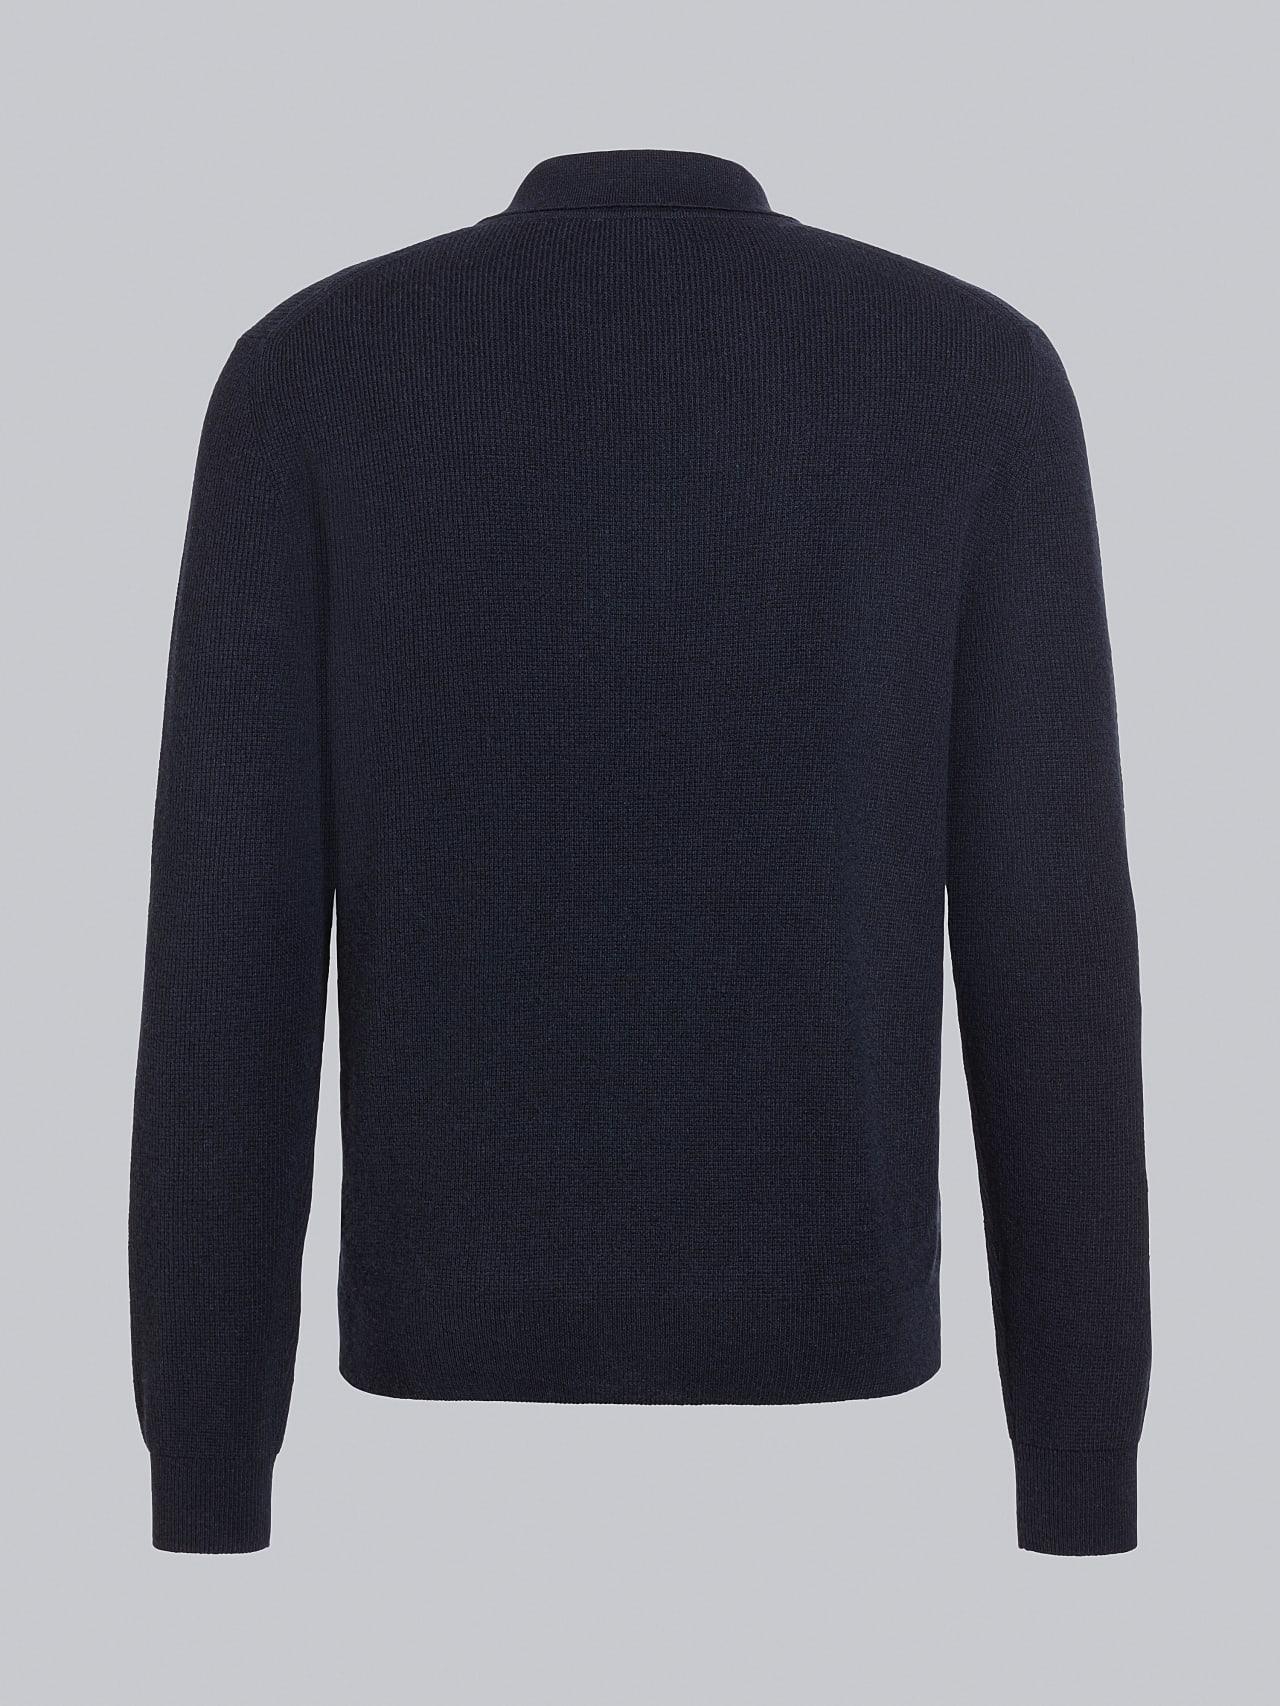 FORCE V1.Y5.02 Cashmere-Blend Knit Polo Longsleeve navy Left Alpha Tauri